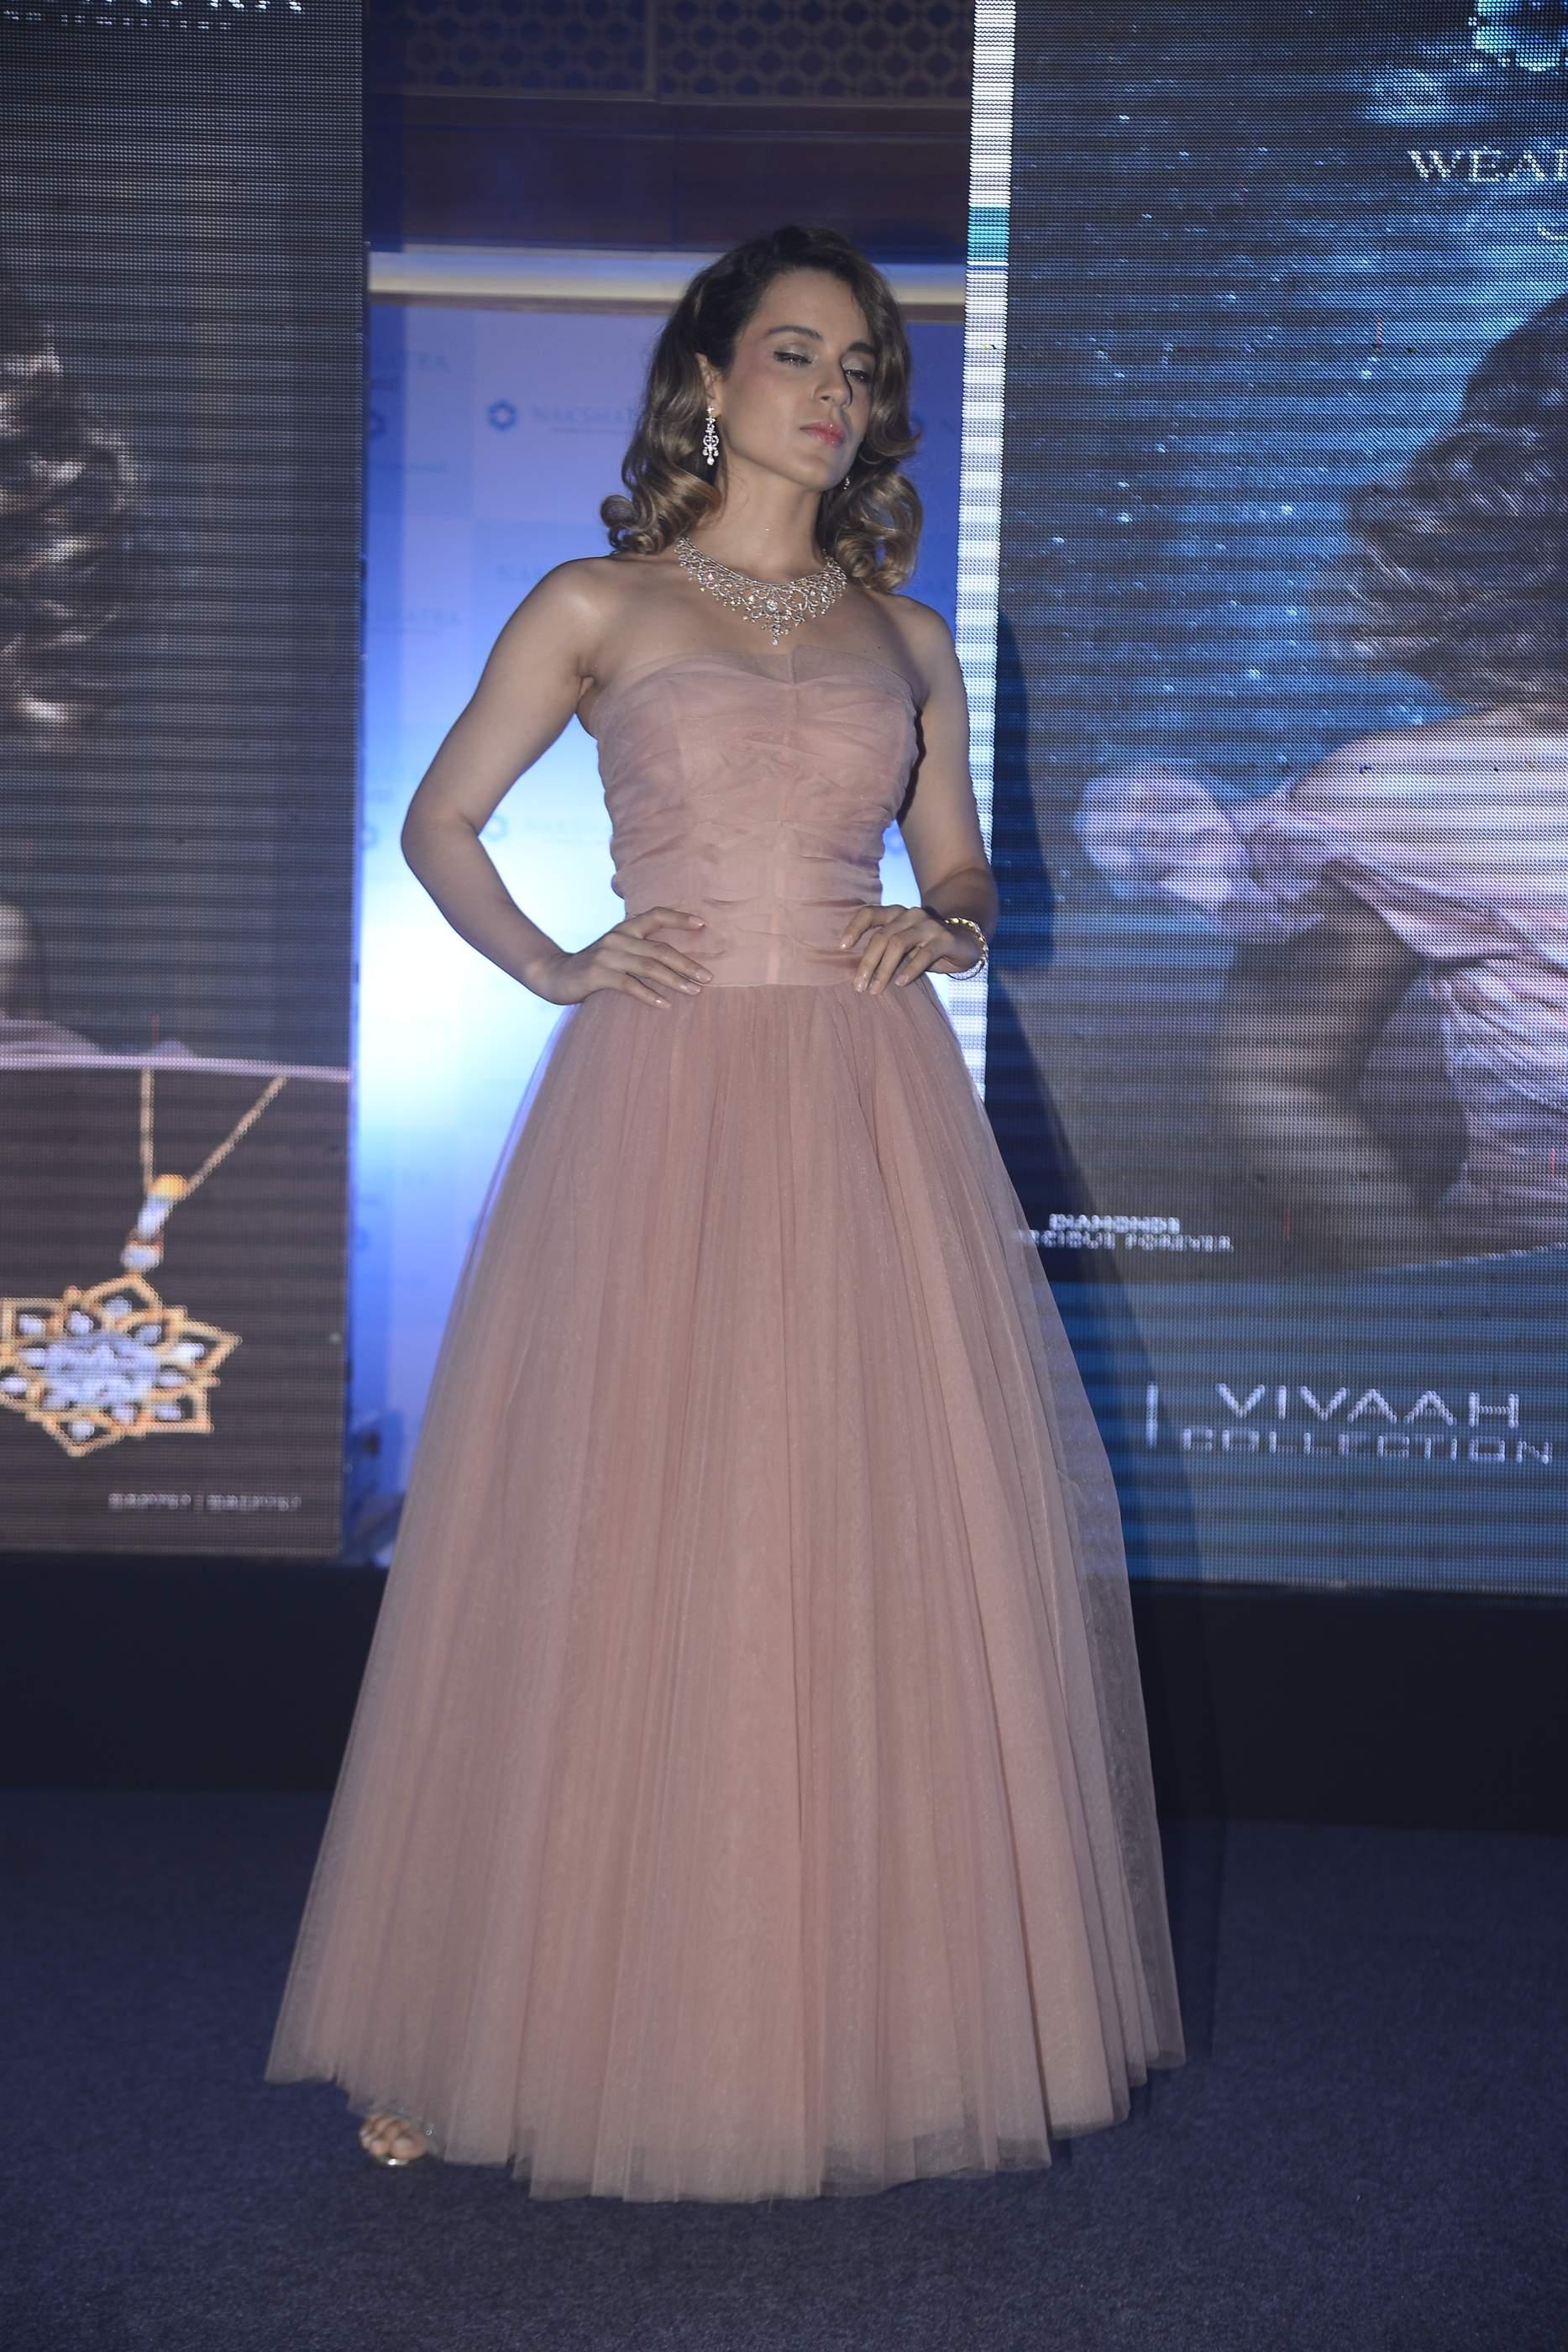 Kangana Ranaut Beautiful Kangana Ranaut Dazzles In Stunning Outfit | Nakshatra Kangana Nakshatra 2